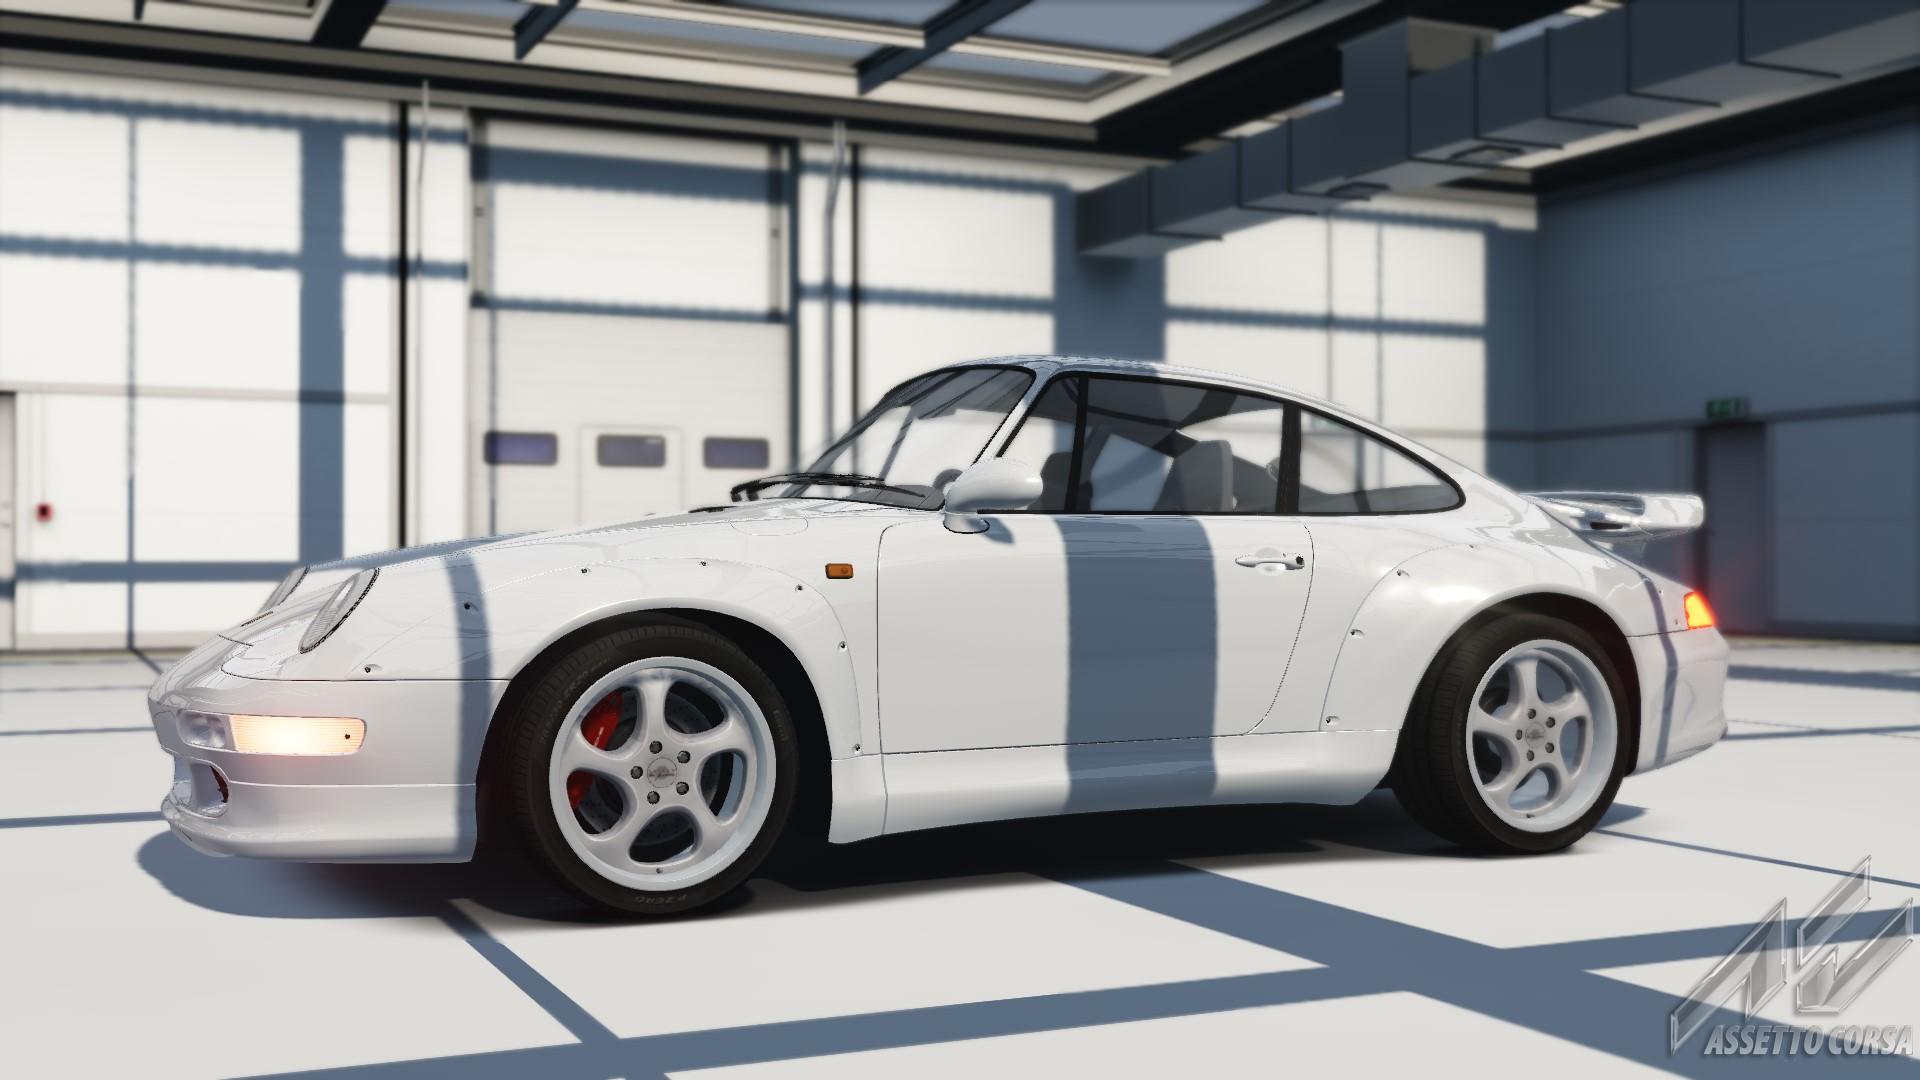 911 993 turbo porsche car download assetto corsa database. Black Bedroom Furniture Sets. Home Design Ideas